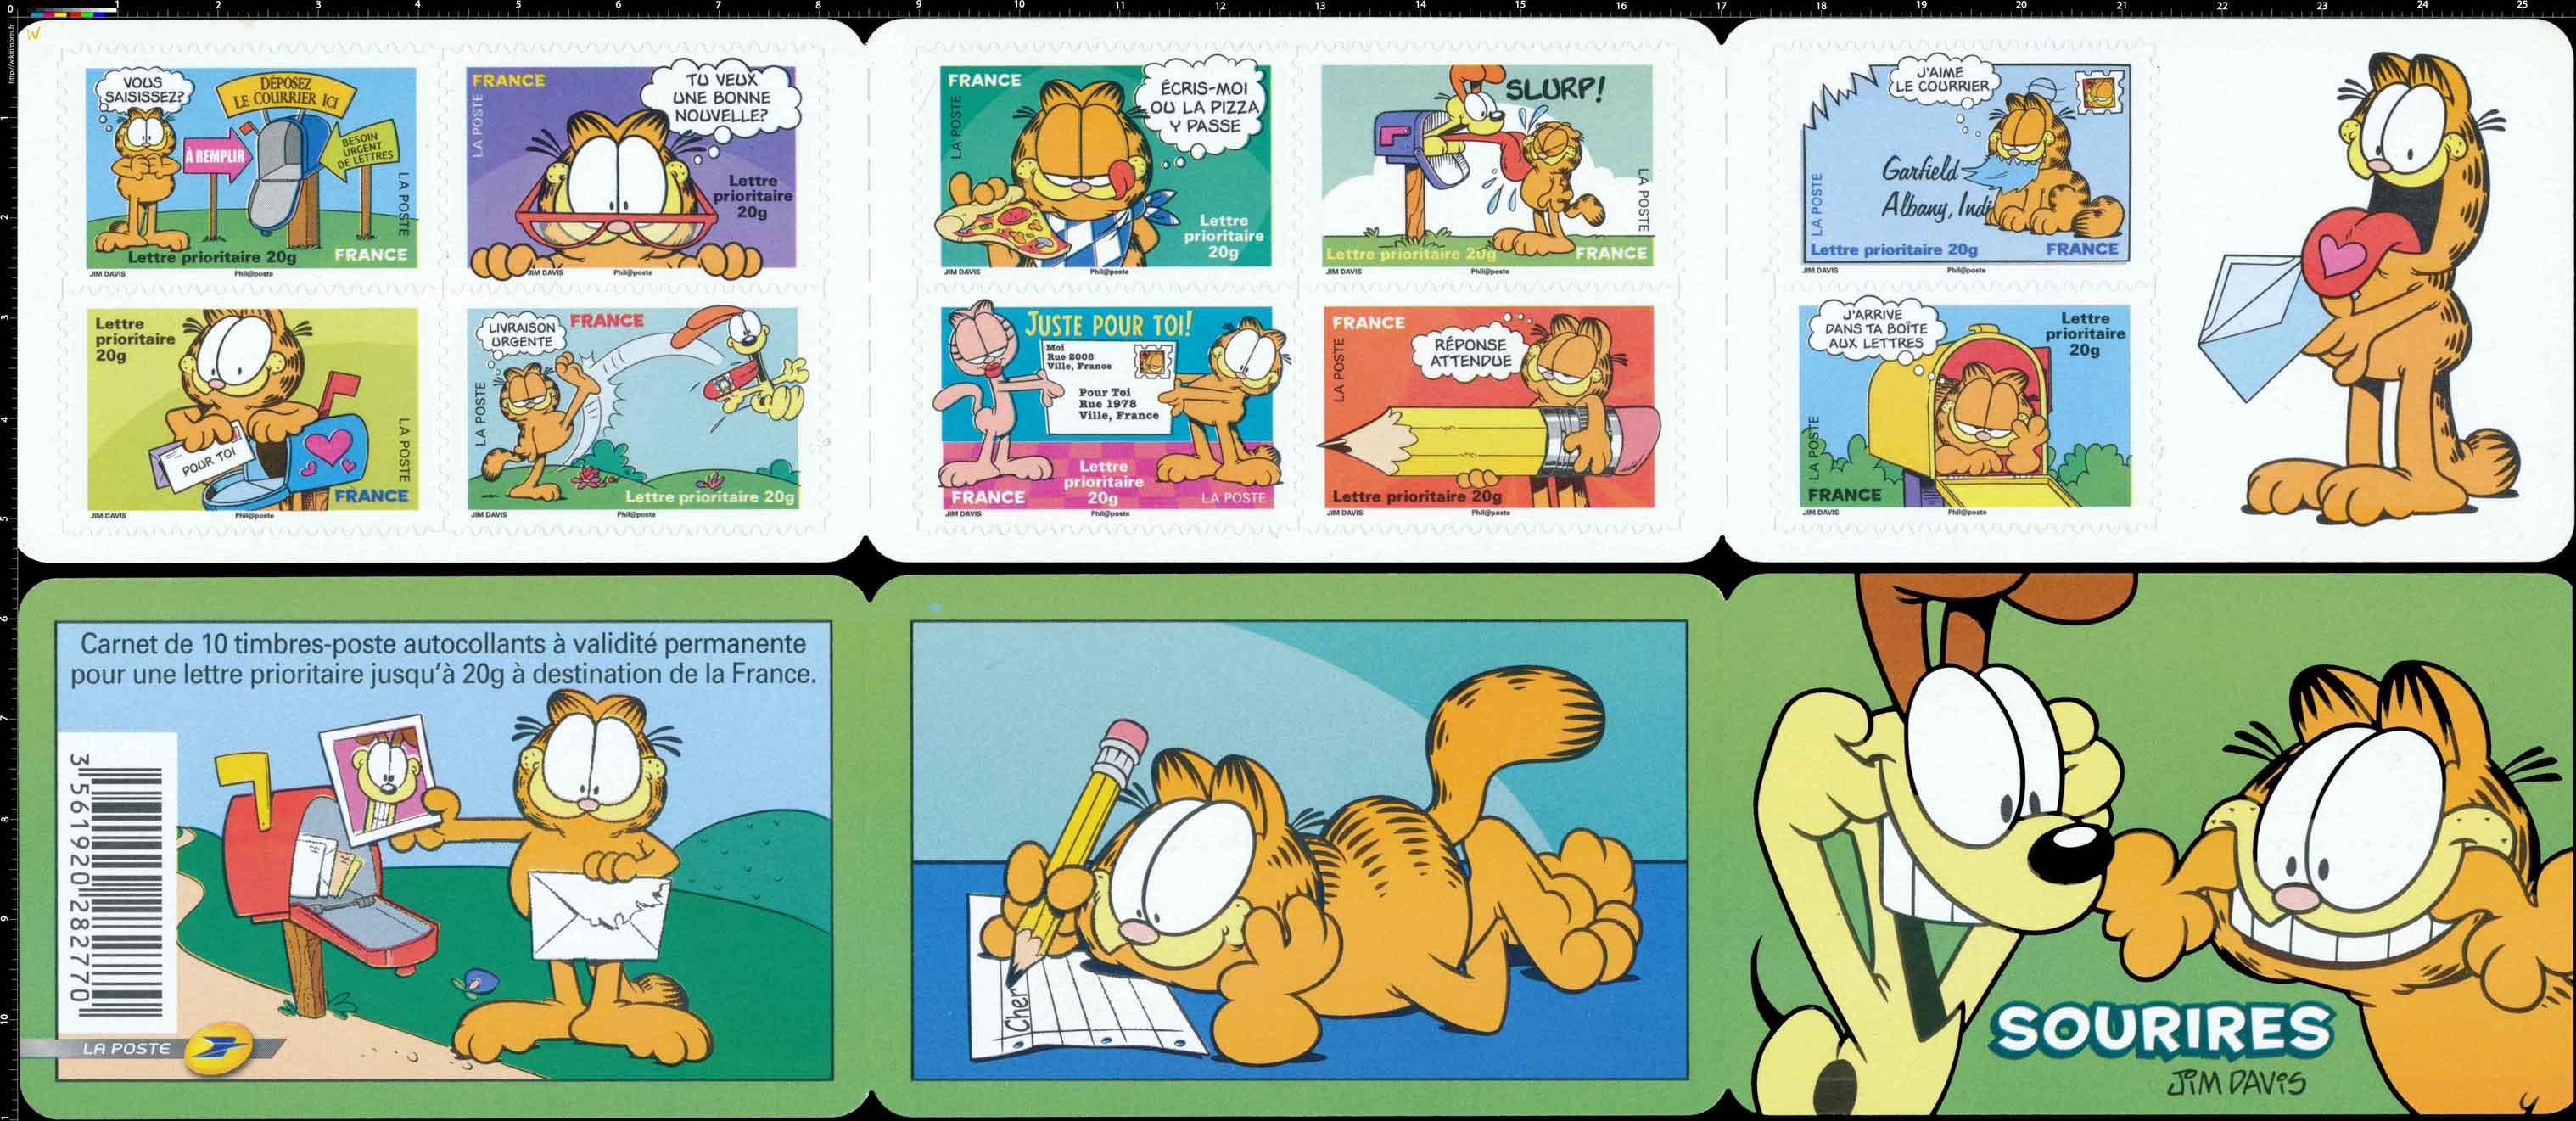 Carnet sourires : Garfield